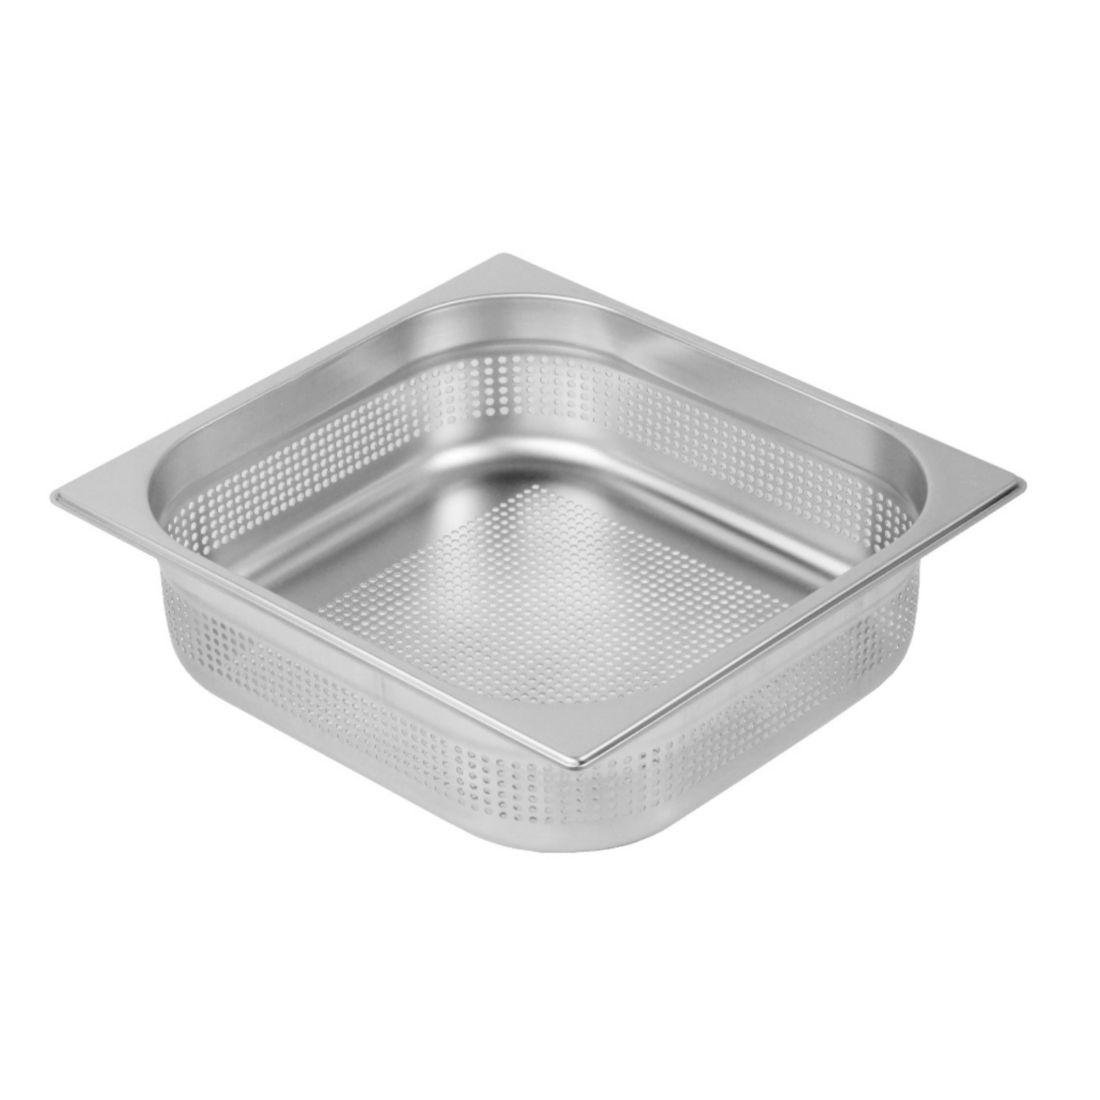 Gastronádoba perforovaná GN 2/3 020 mm